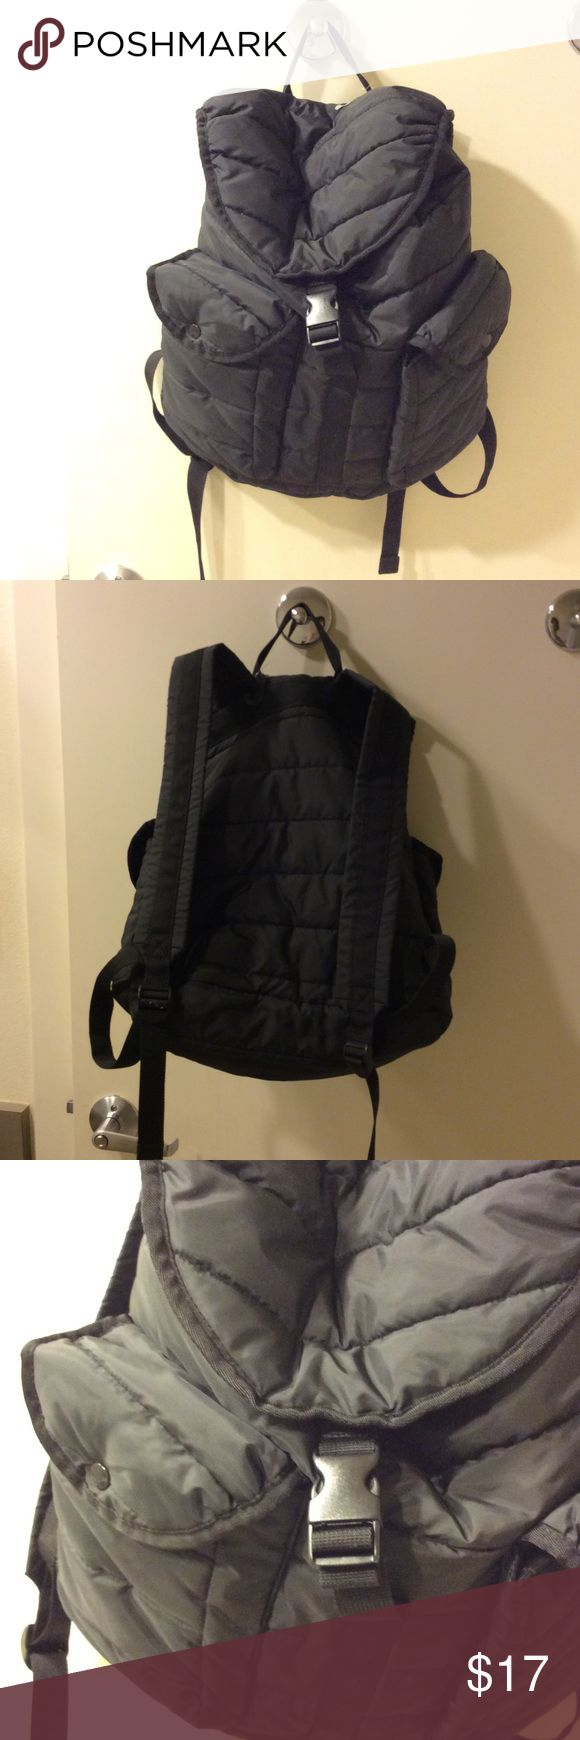 Uniqlo Backpack Brand new without tag. Looks like Prada. Uniqlo Bags Backpacks